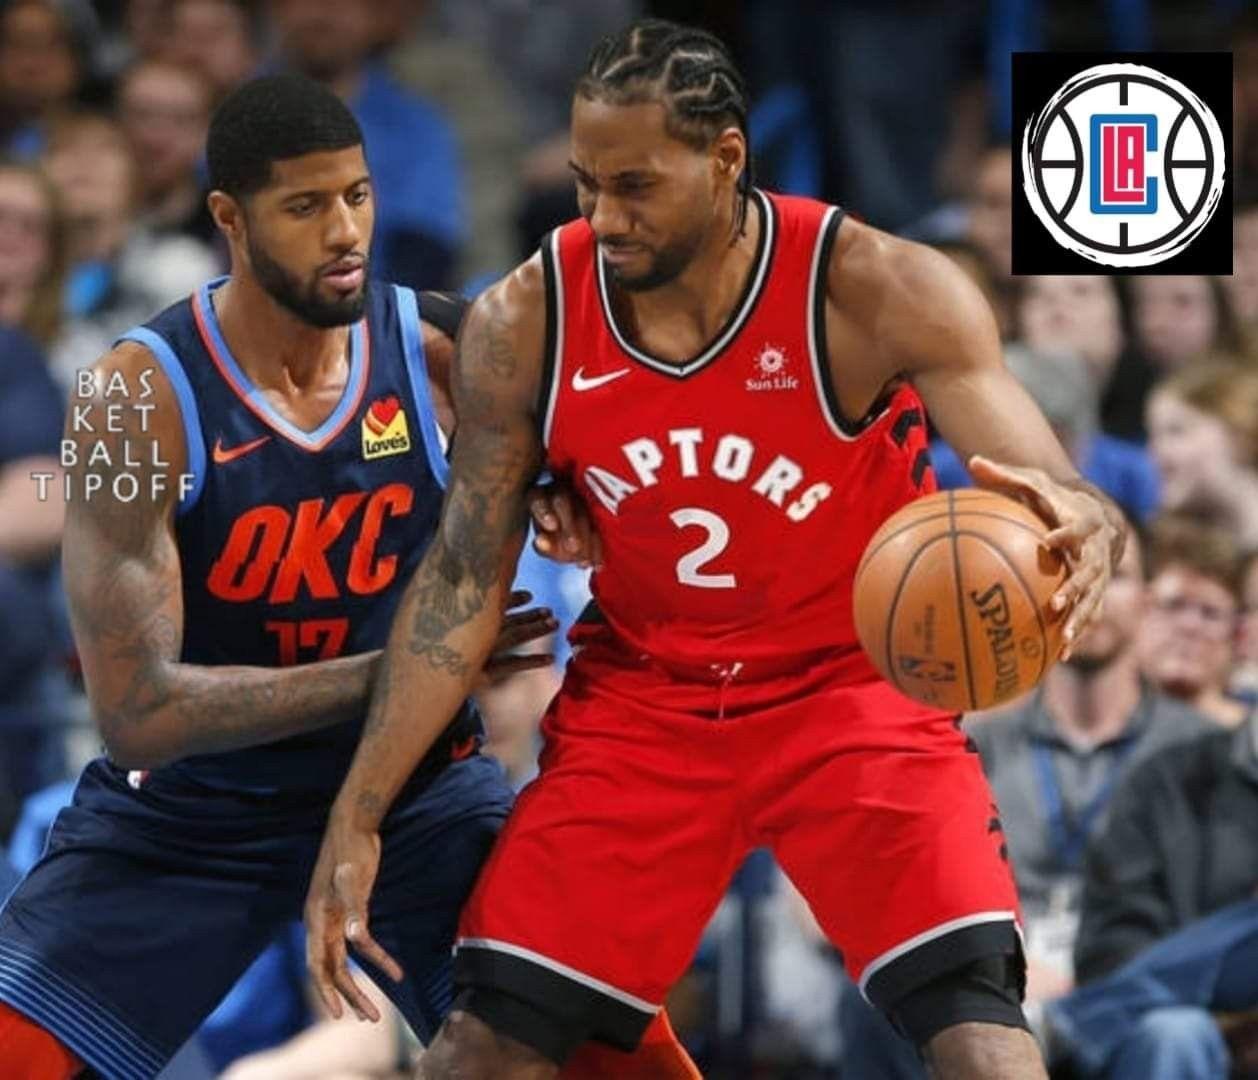 Paul George Kawhi Leonard Now Teammates Clippers Basketball Funny Nba Champions Nba News